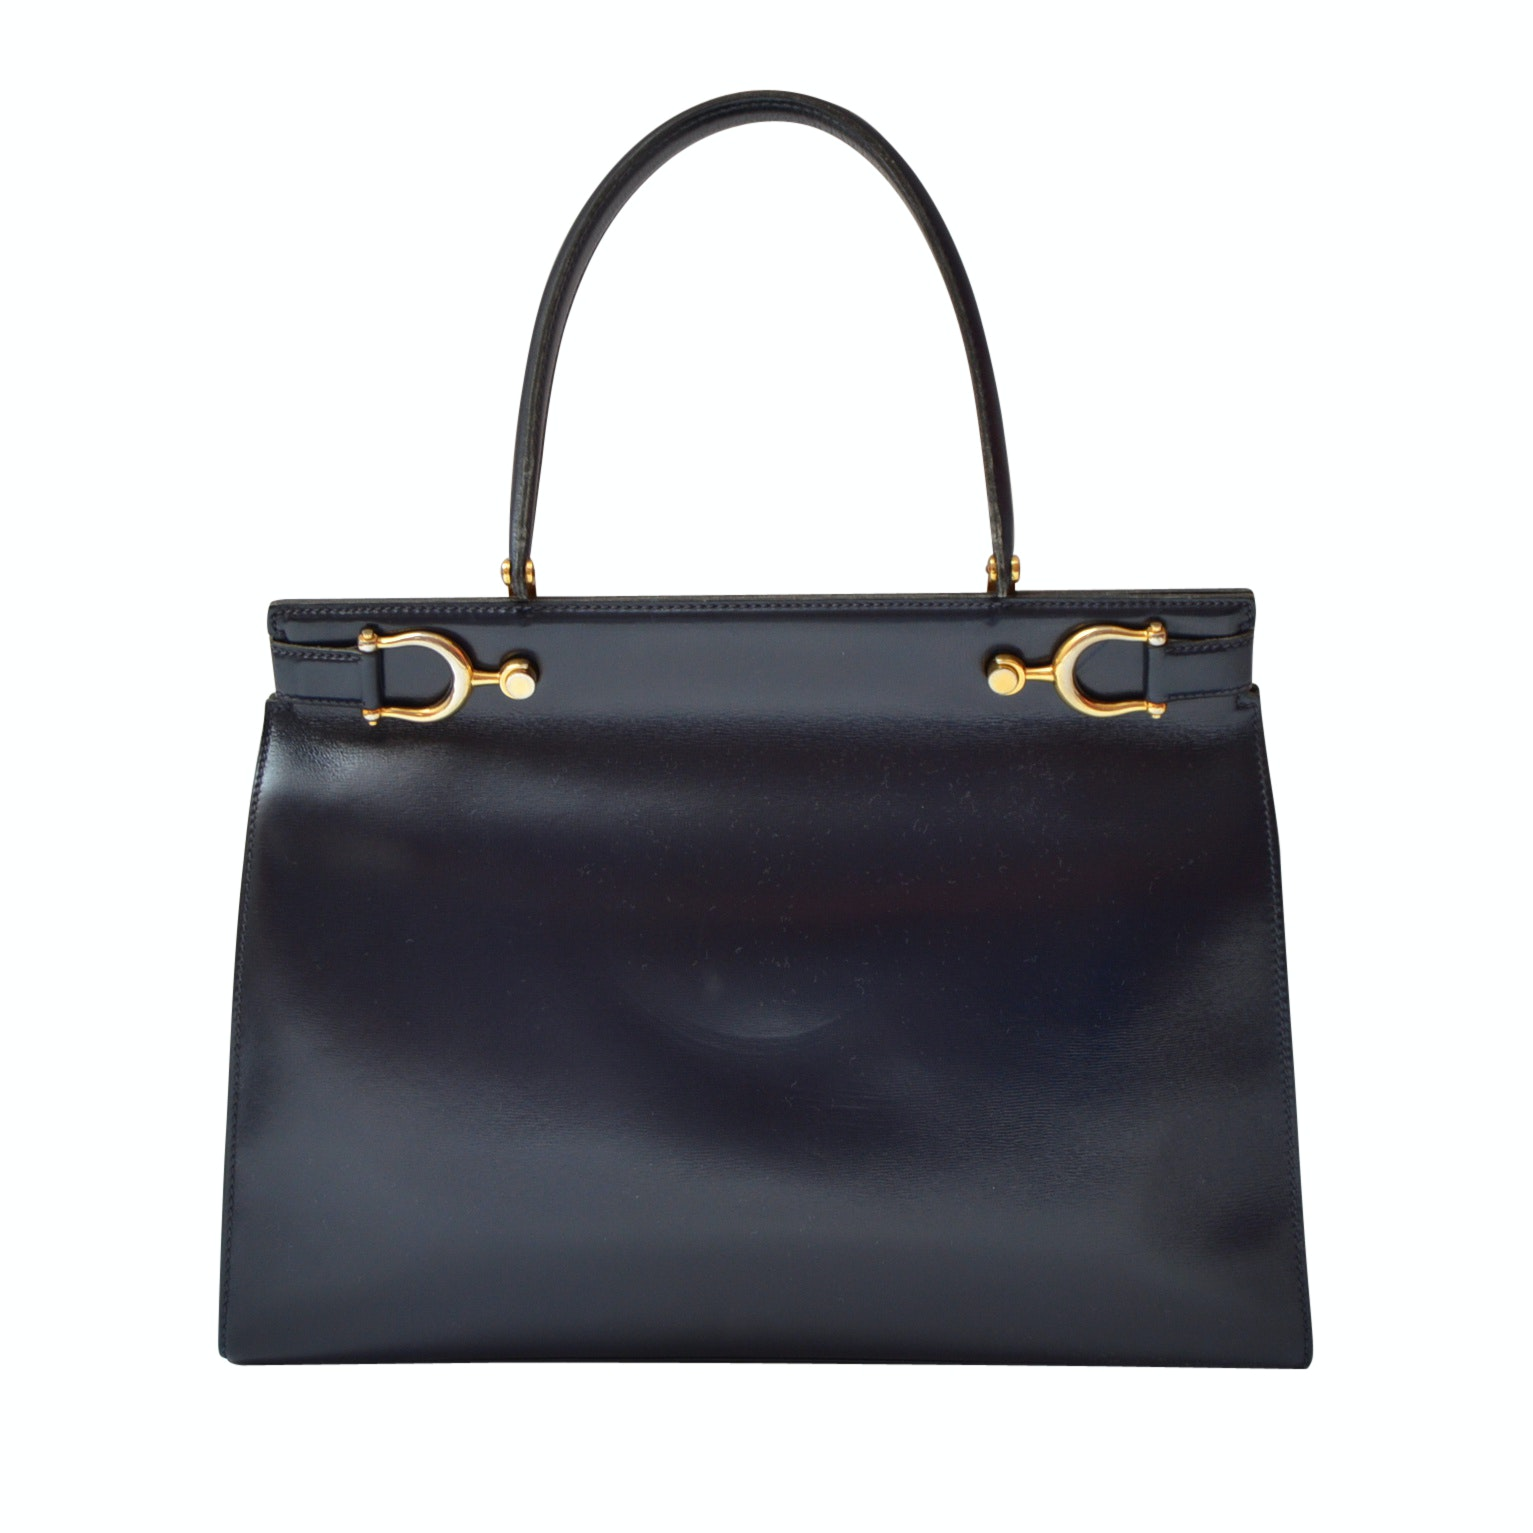 G Navy Blue Leather Top Handle Handbag